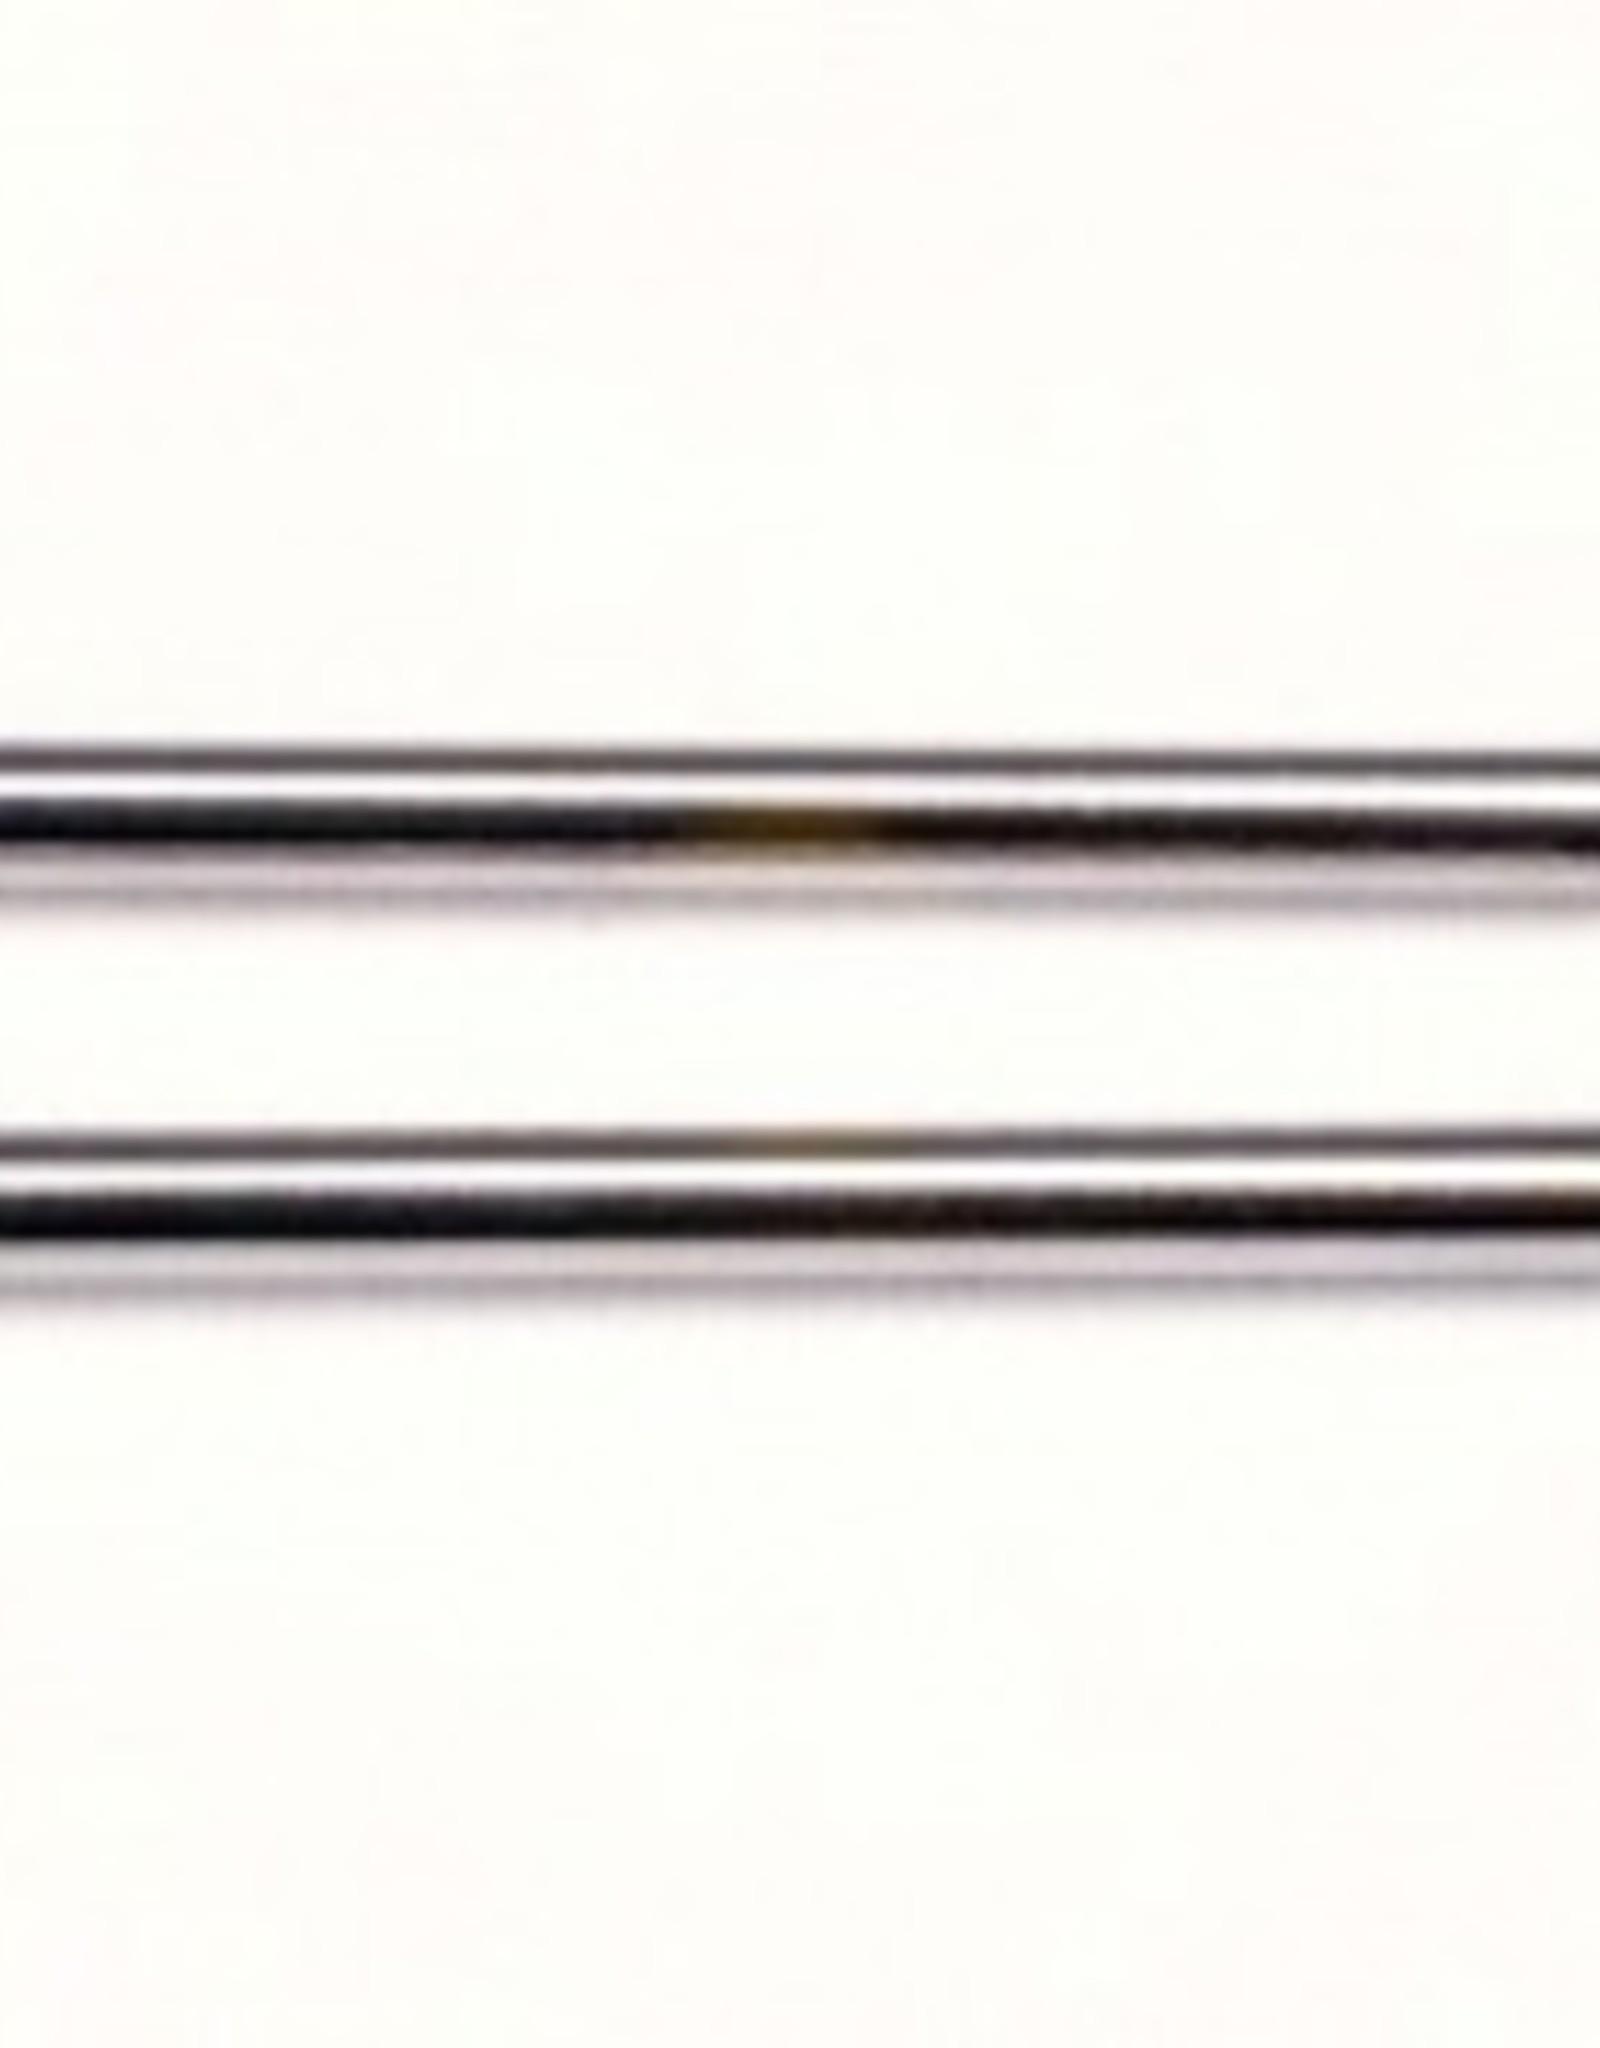 Traxxas Traxxas Shock shafts, steel, chrome finish (long) (2) TRA1664